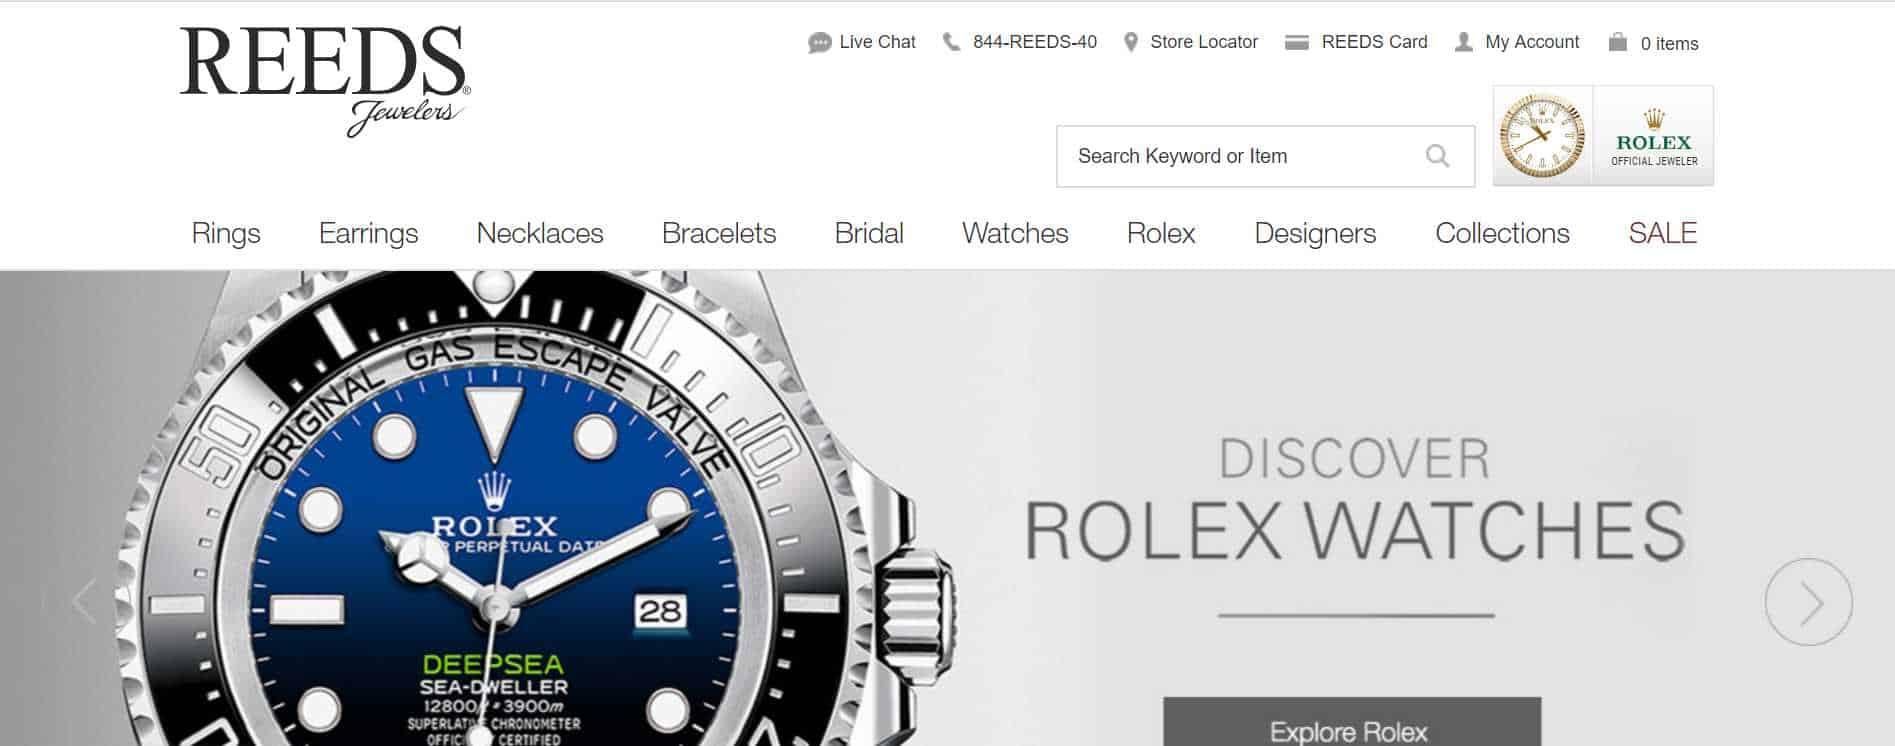 reeds luxury watches online black friday 2018